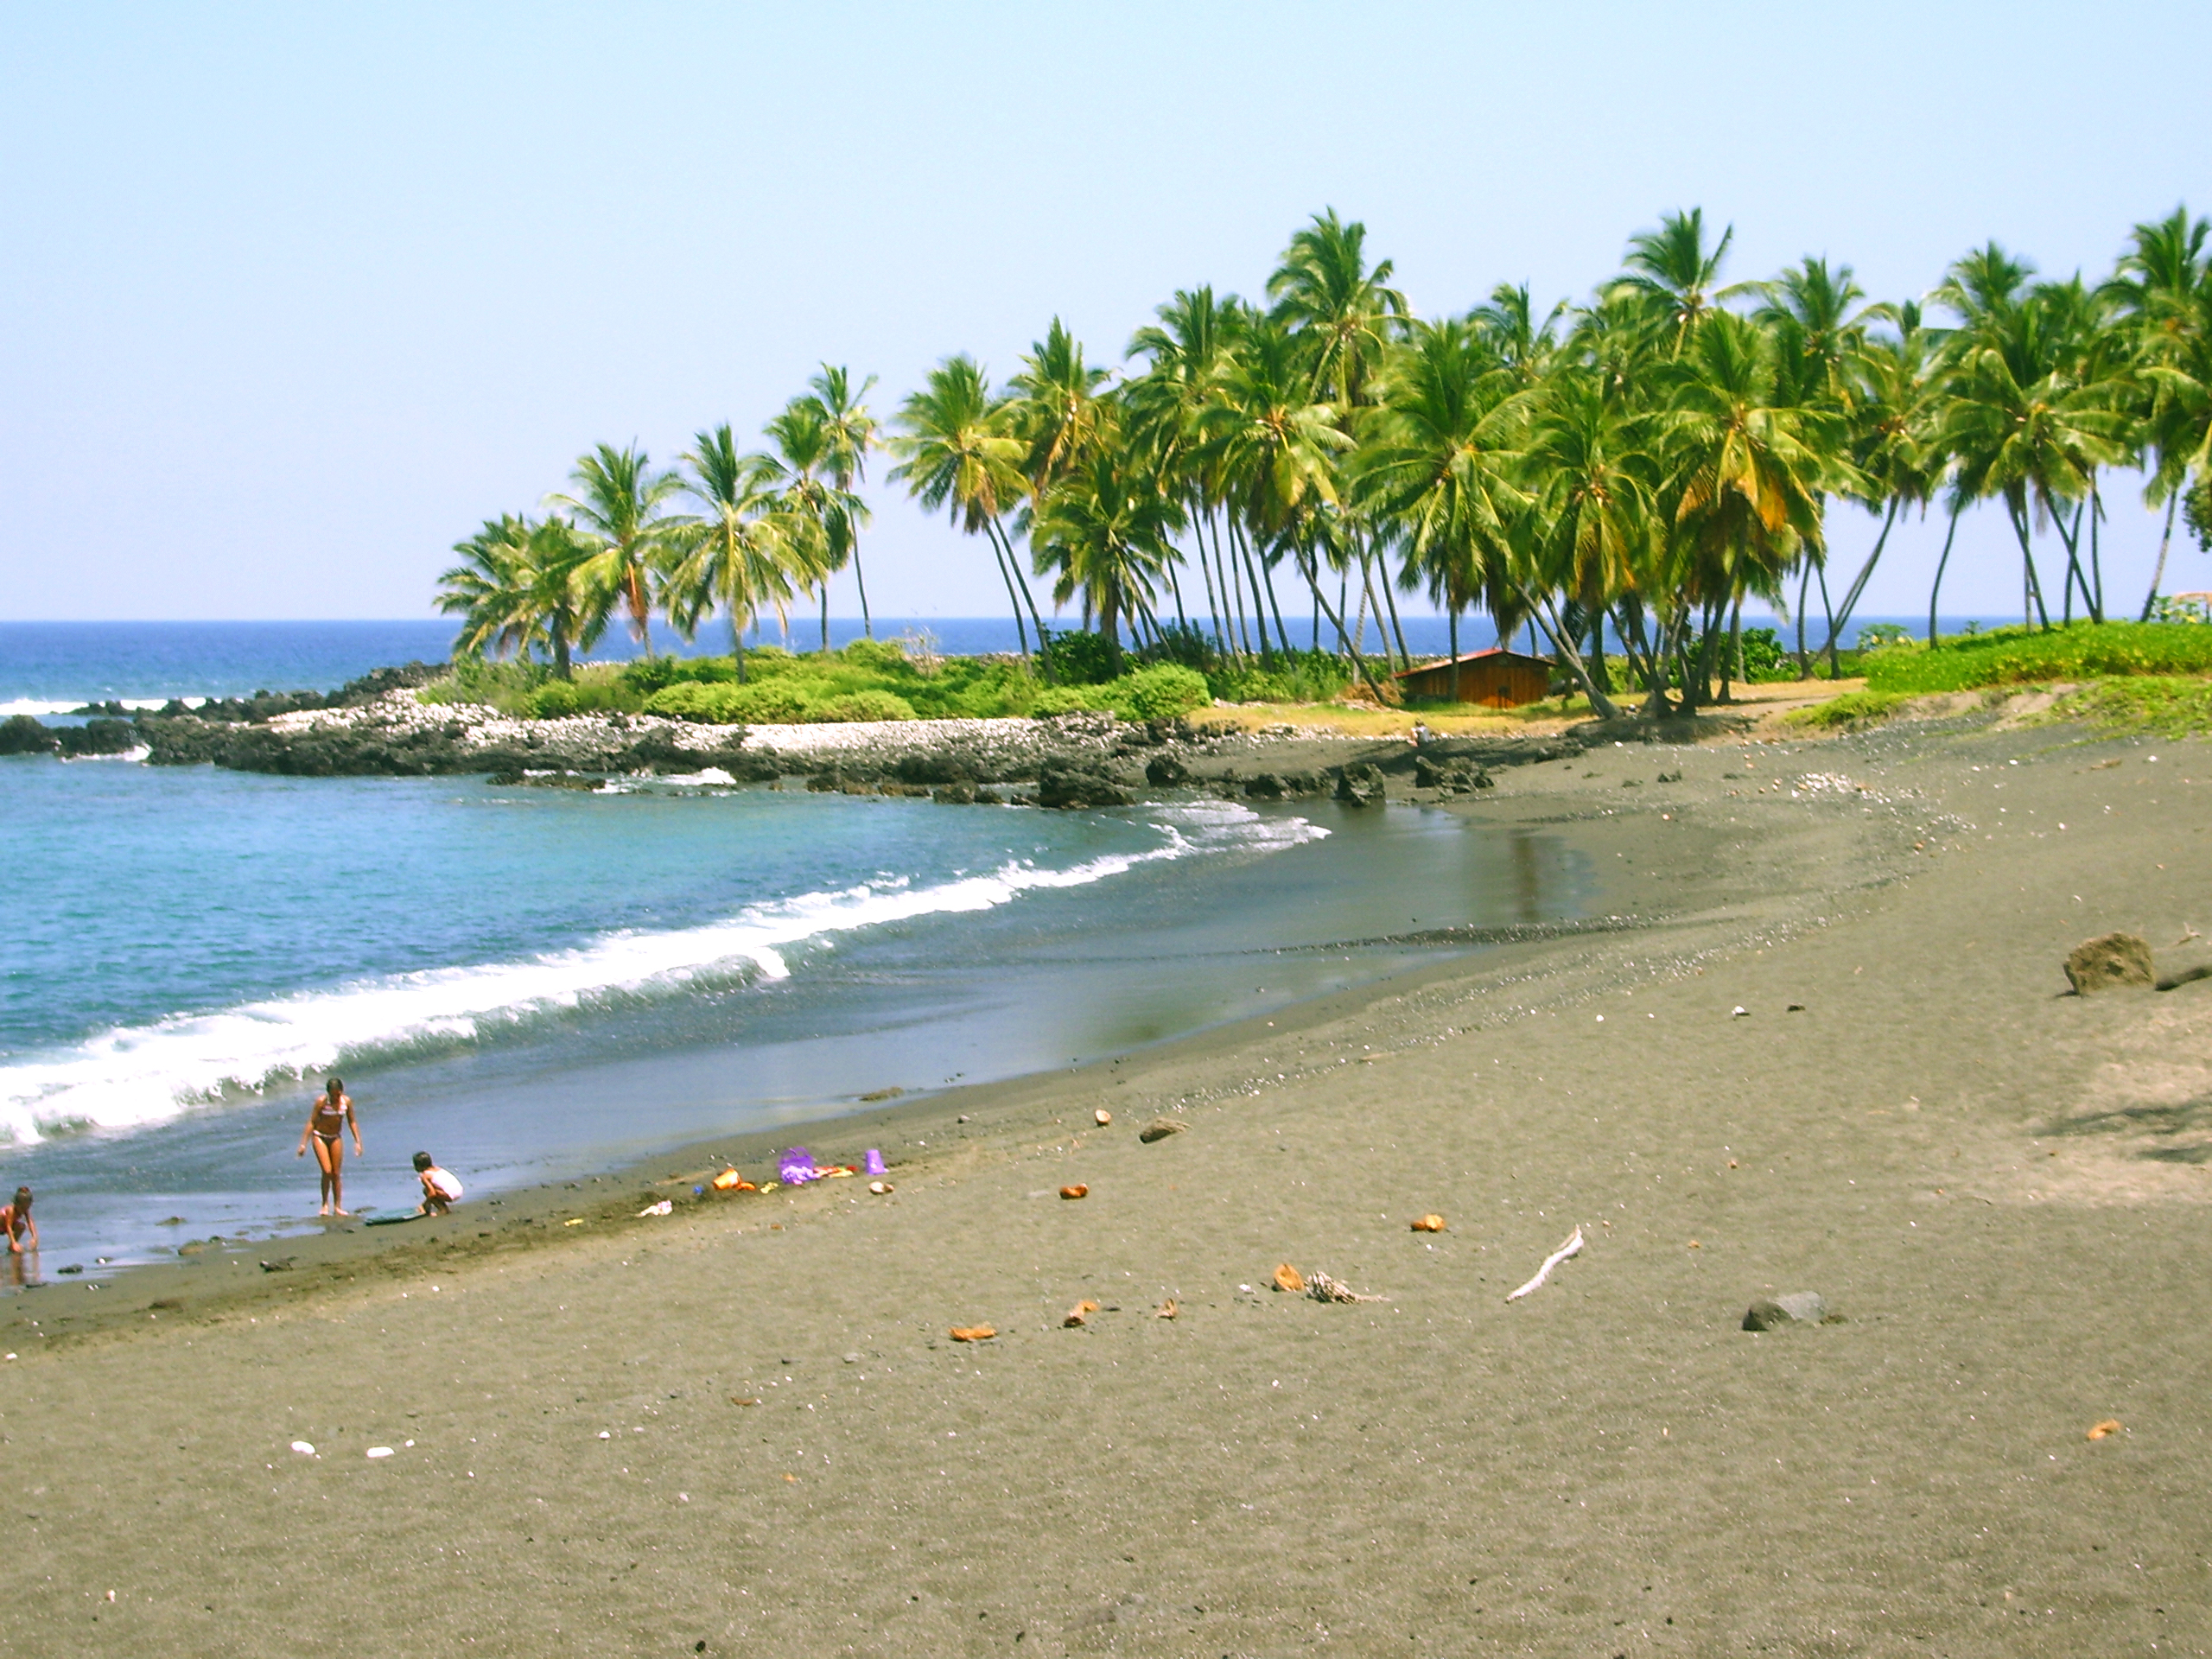 Honomalino Beach, South Kona, Hawaii: Photo by Donald MacGowan